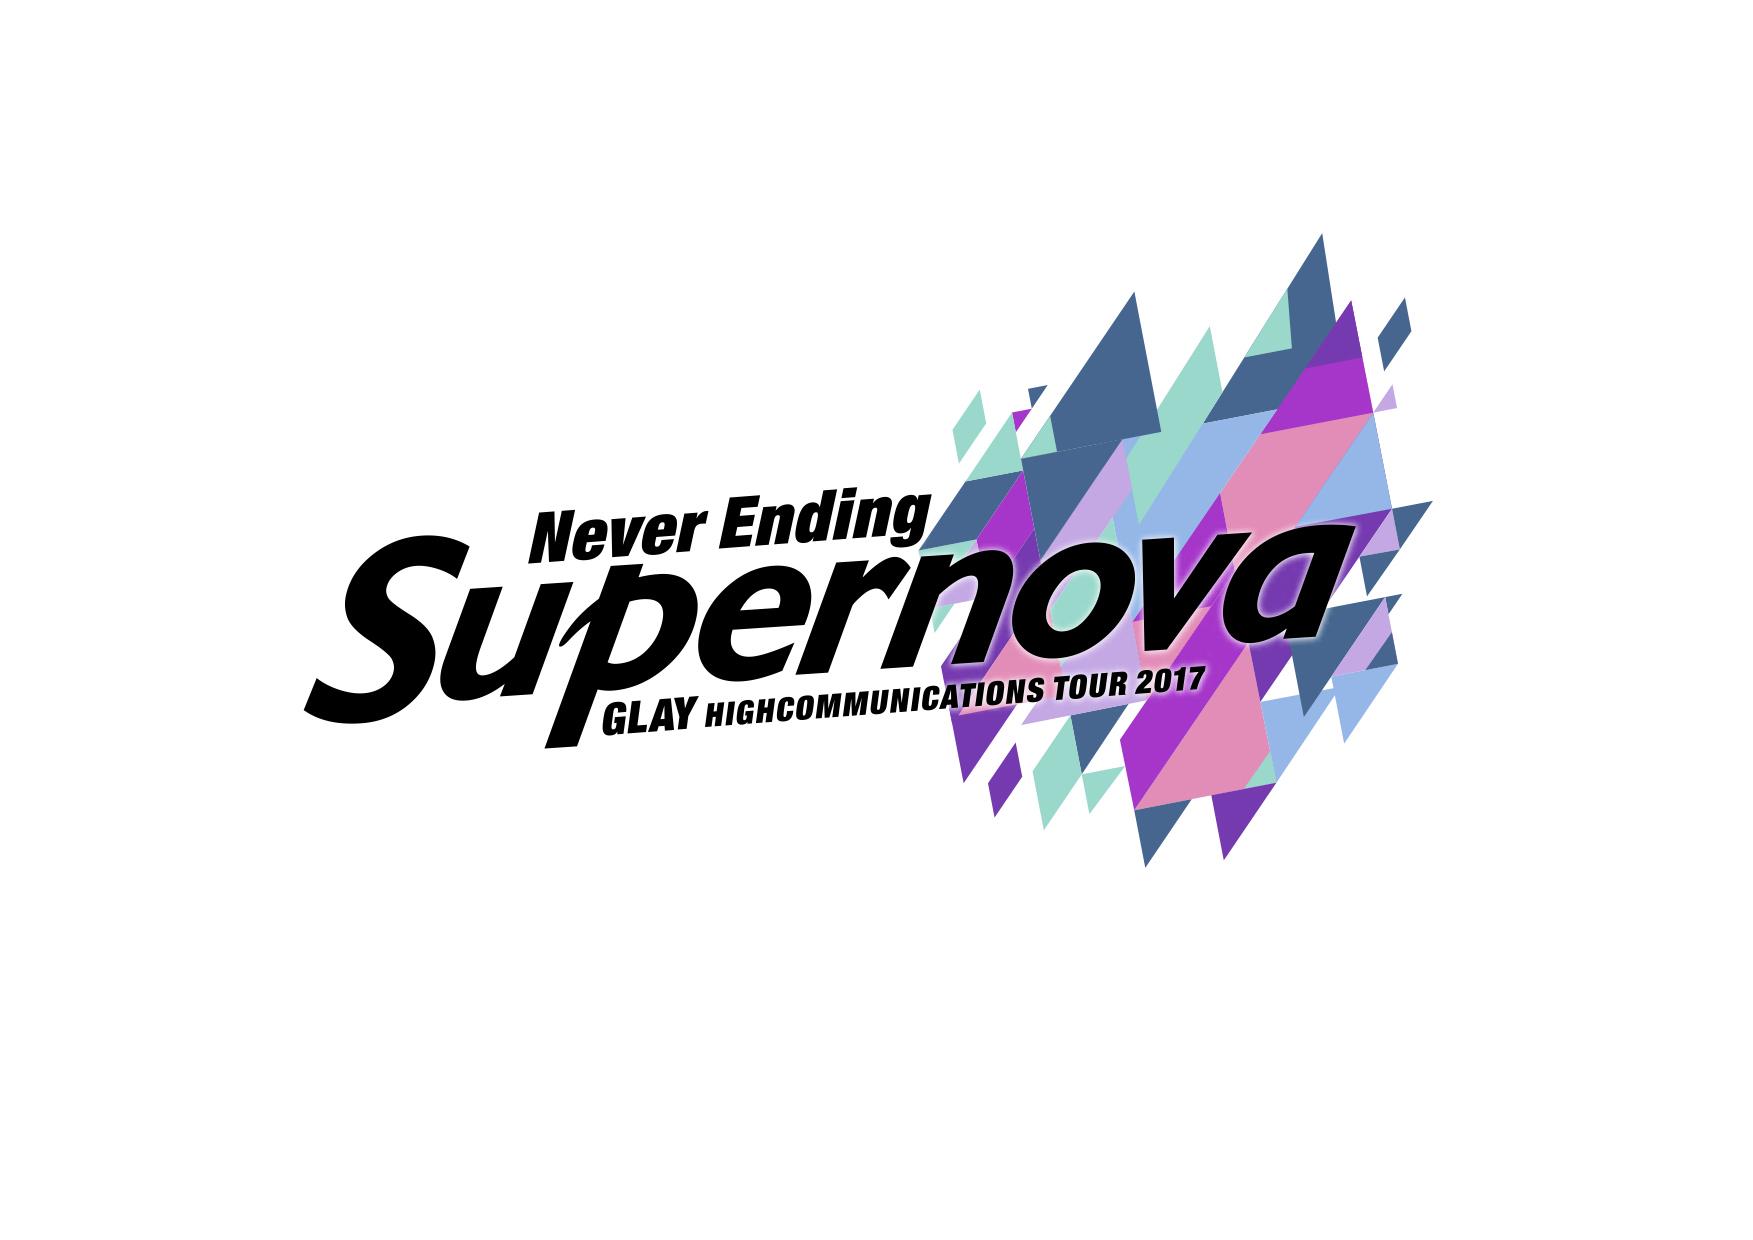 『GLAY HIGHCOMMUNICATIONS TOUR 2017 -Never Ending Supernova-』ロゴ